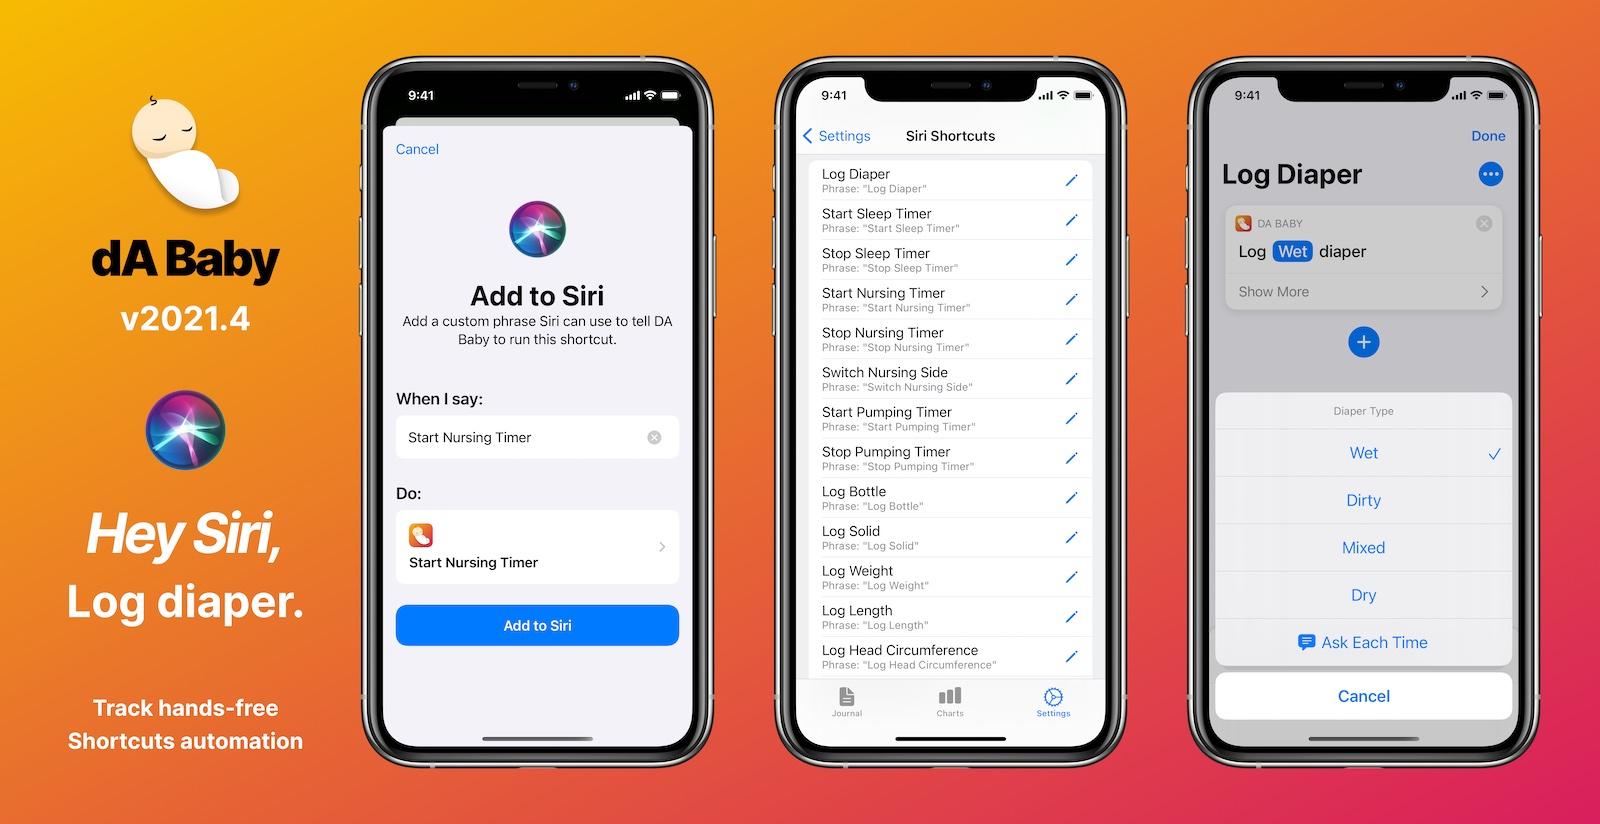 DA Baby v2021.4 adds Siri Shortcuts support